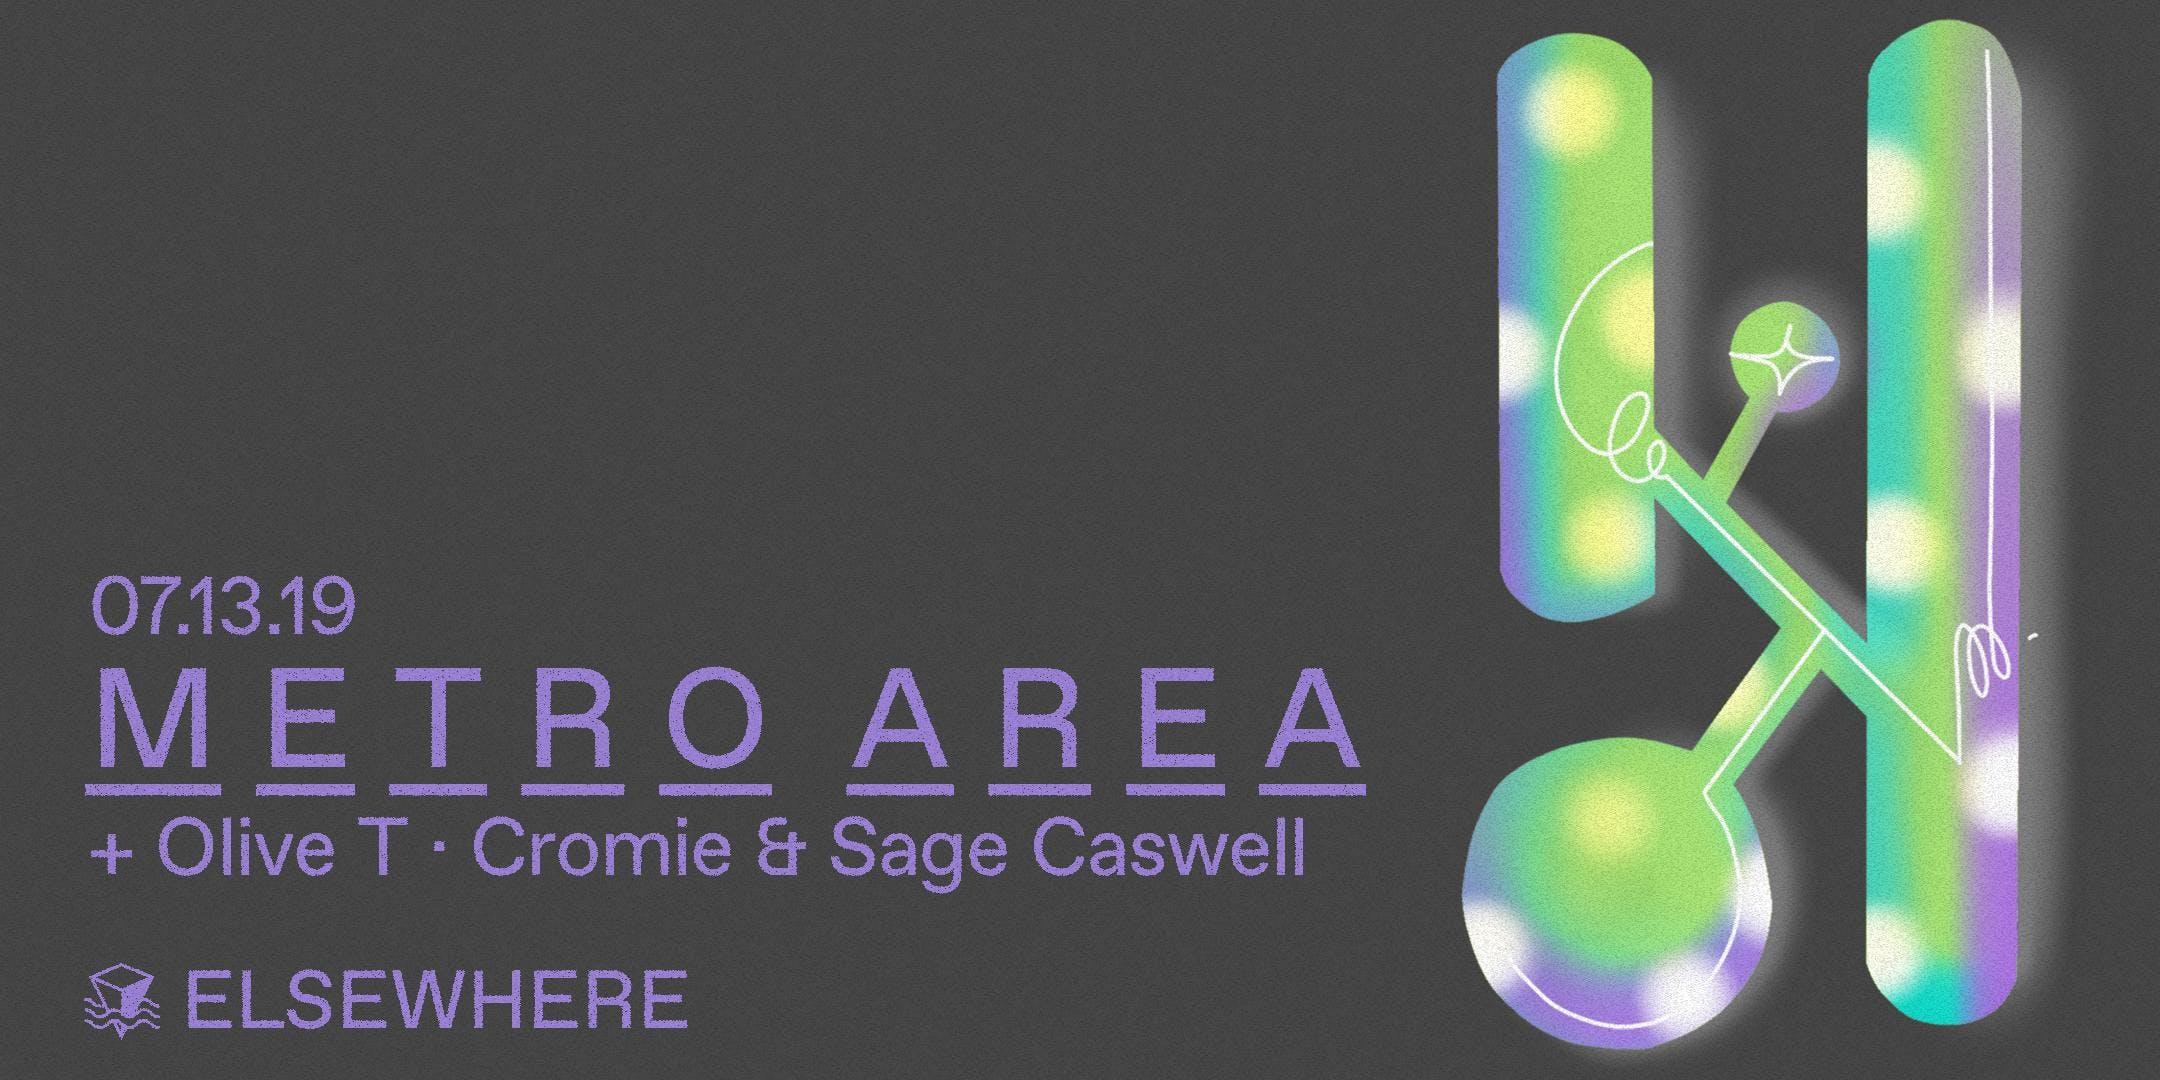 Metro Area, Olive T, Cromie & Sage Caswell